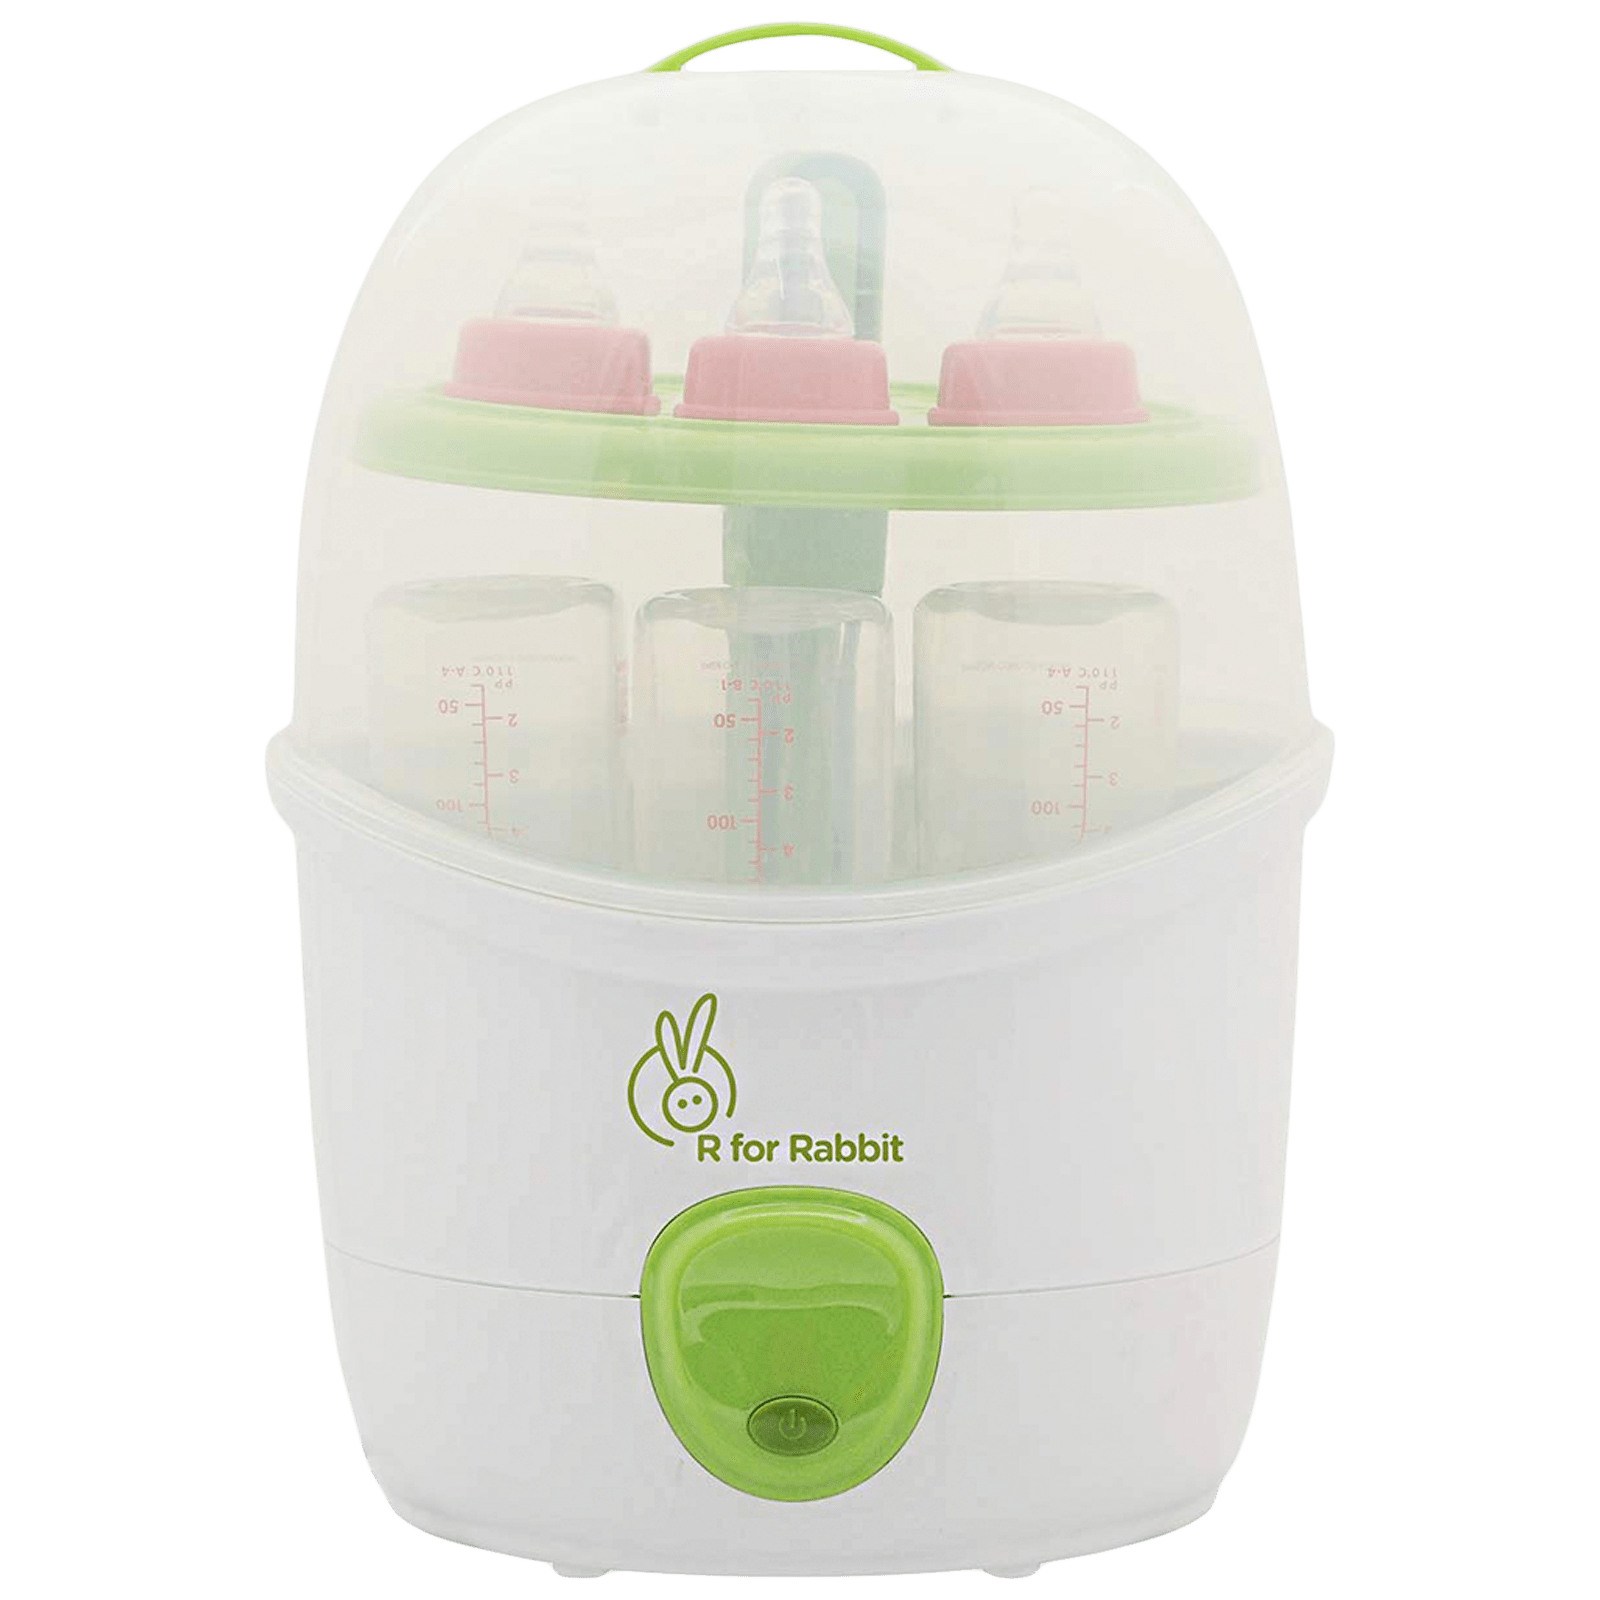 R for Rabbit Peter Fighter Plus Sterilizer (6 Bottles, Auto Shutdown, SZPFGW2, Green/White)